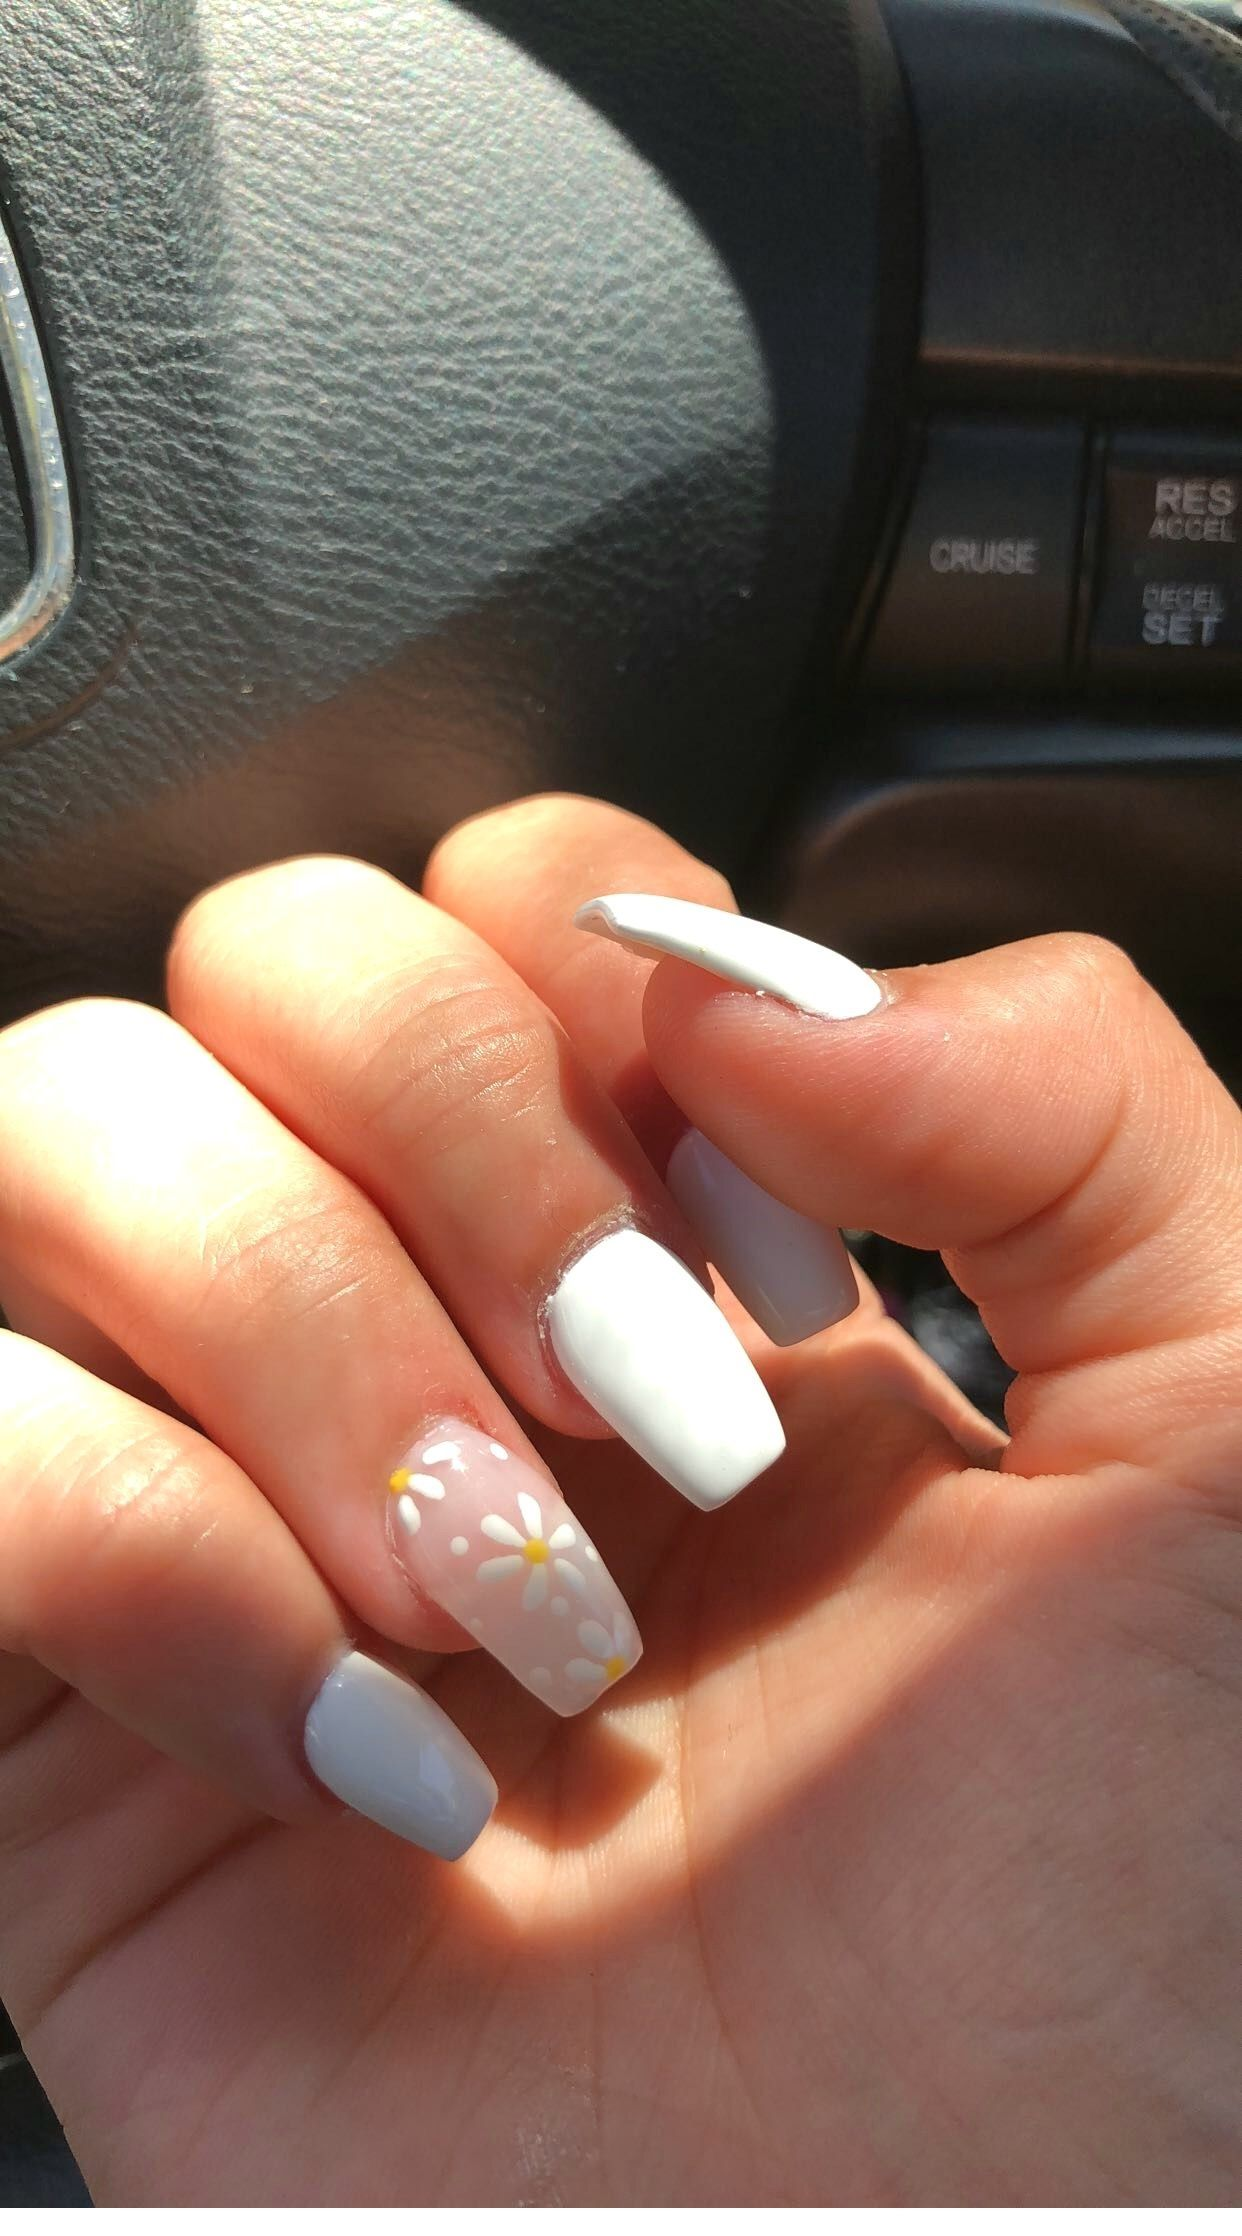 Pretty Acrylic Nails Ideas In 2020 White Acrylic Nails Best Acrylic Nails Summer Acrylic Nails